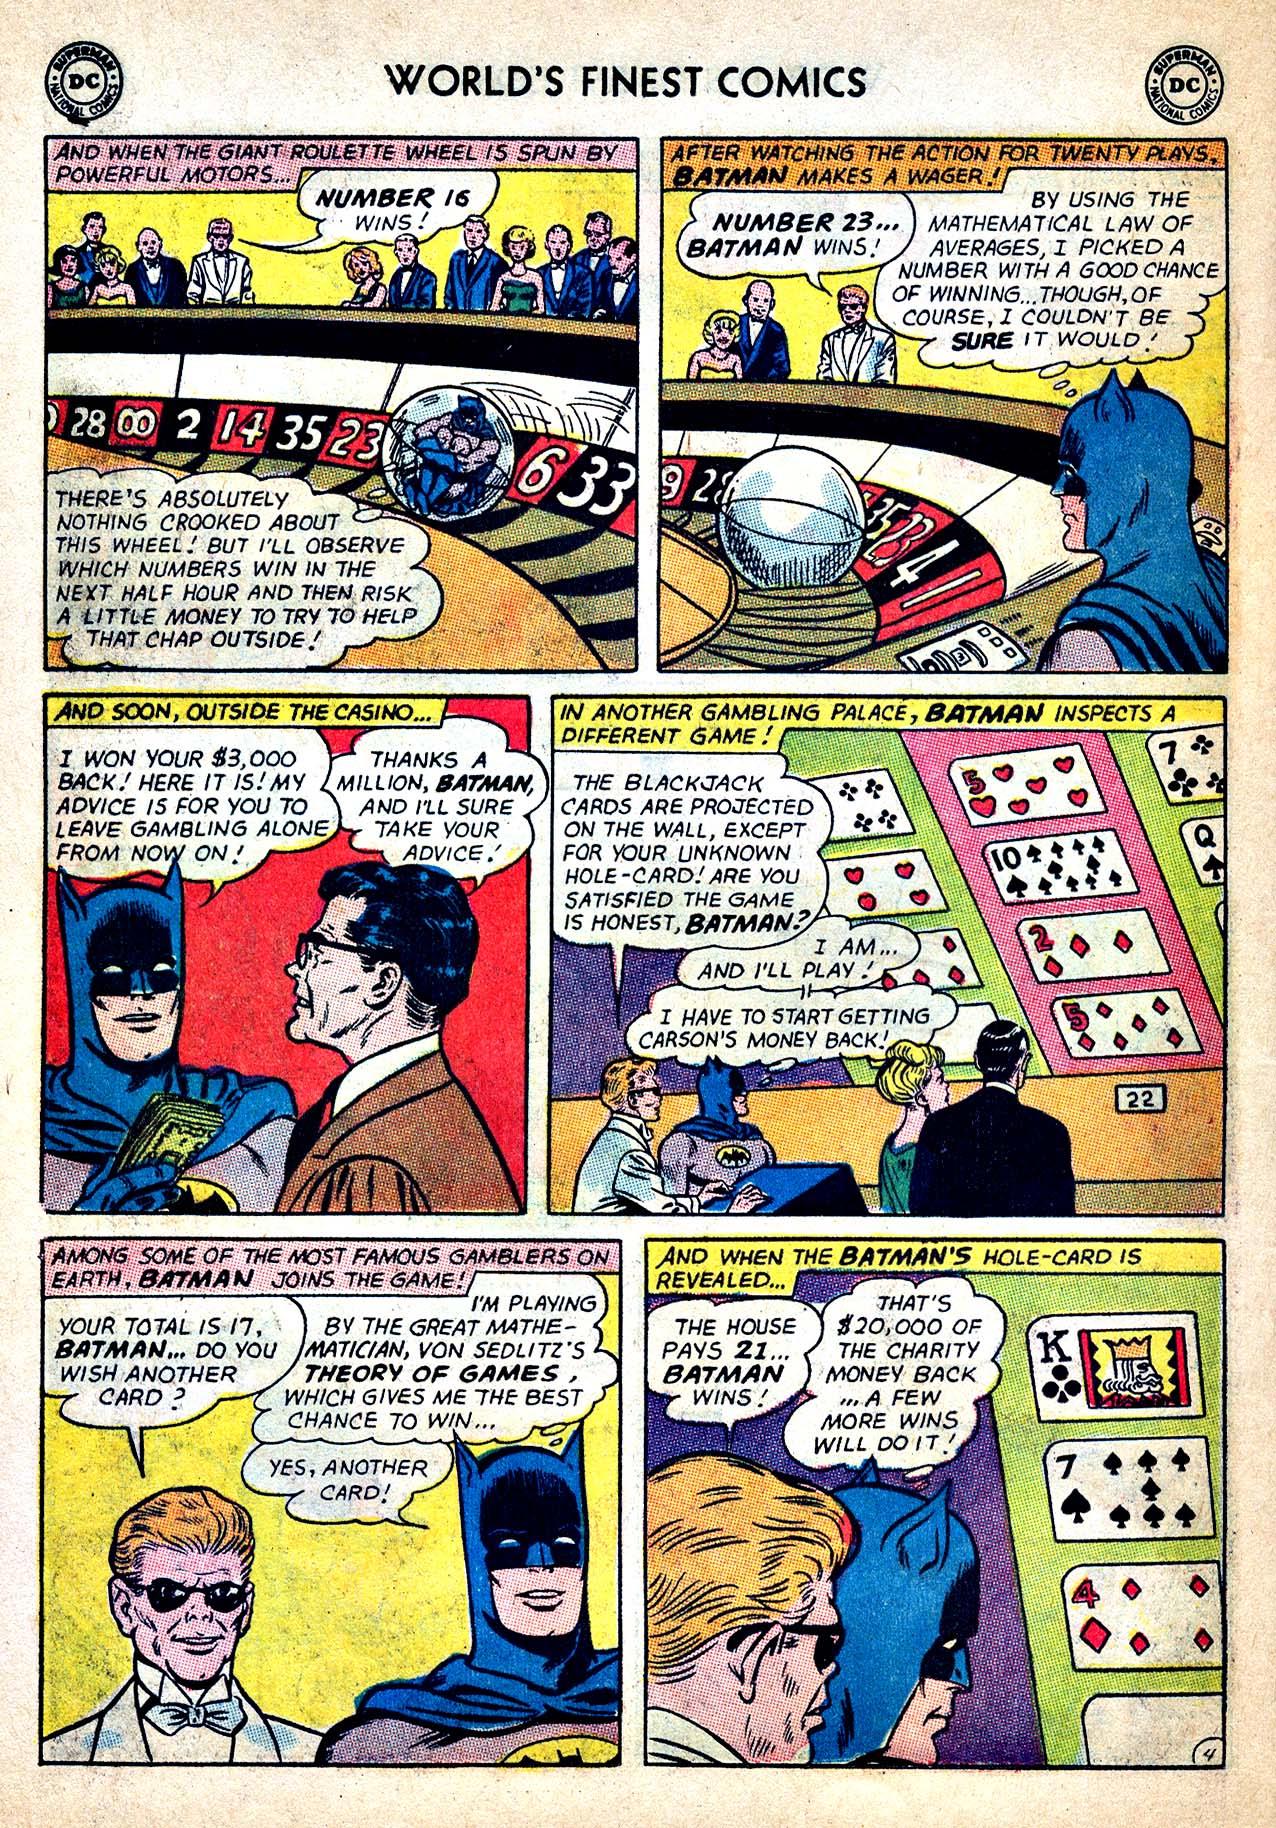 Read online World's Finest Comics comic -  Issue #150 - 6